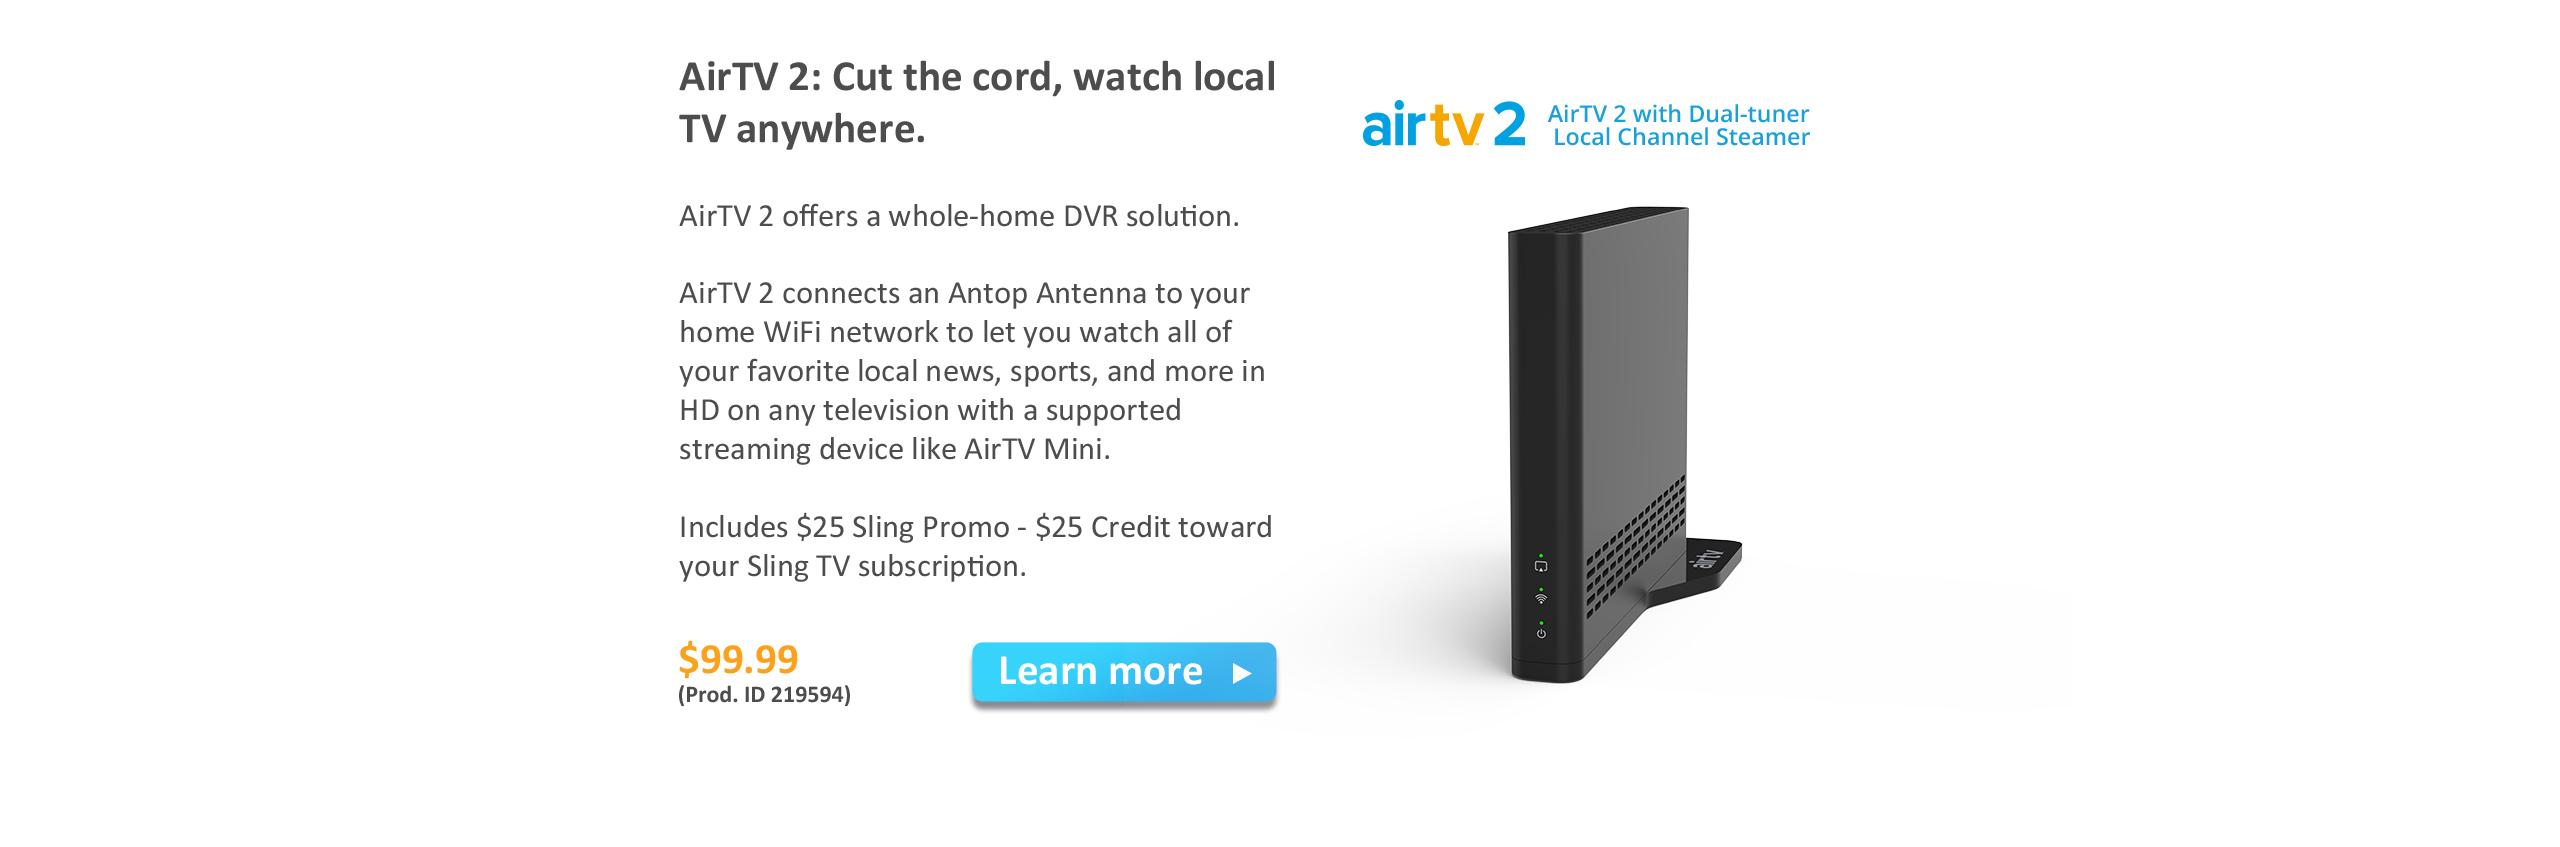 AirTV2